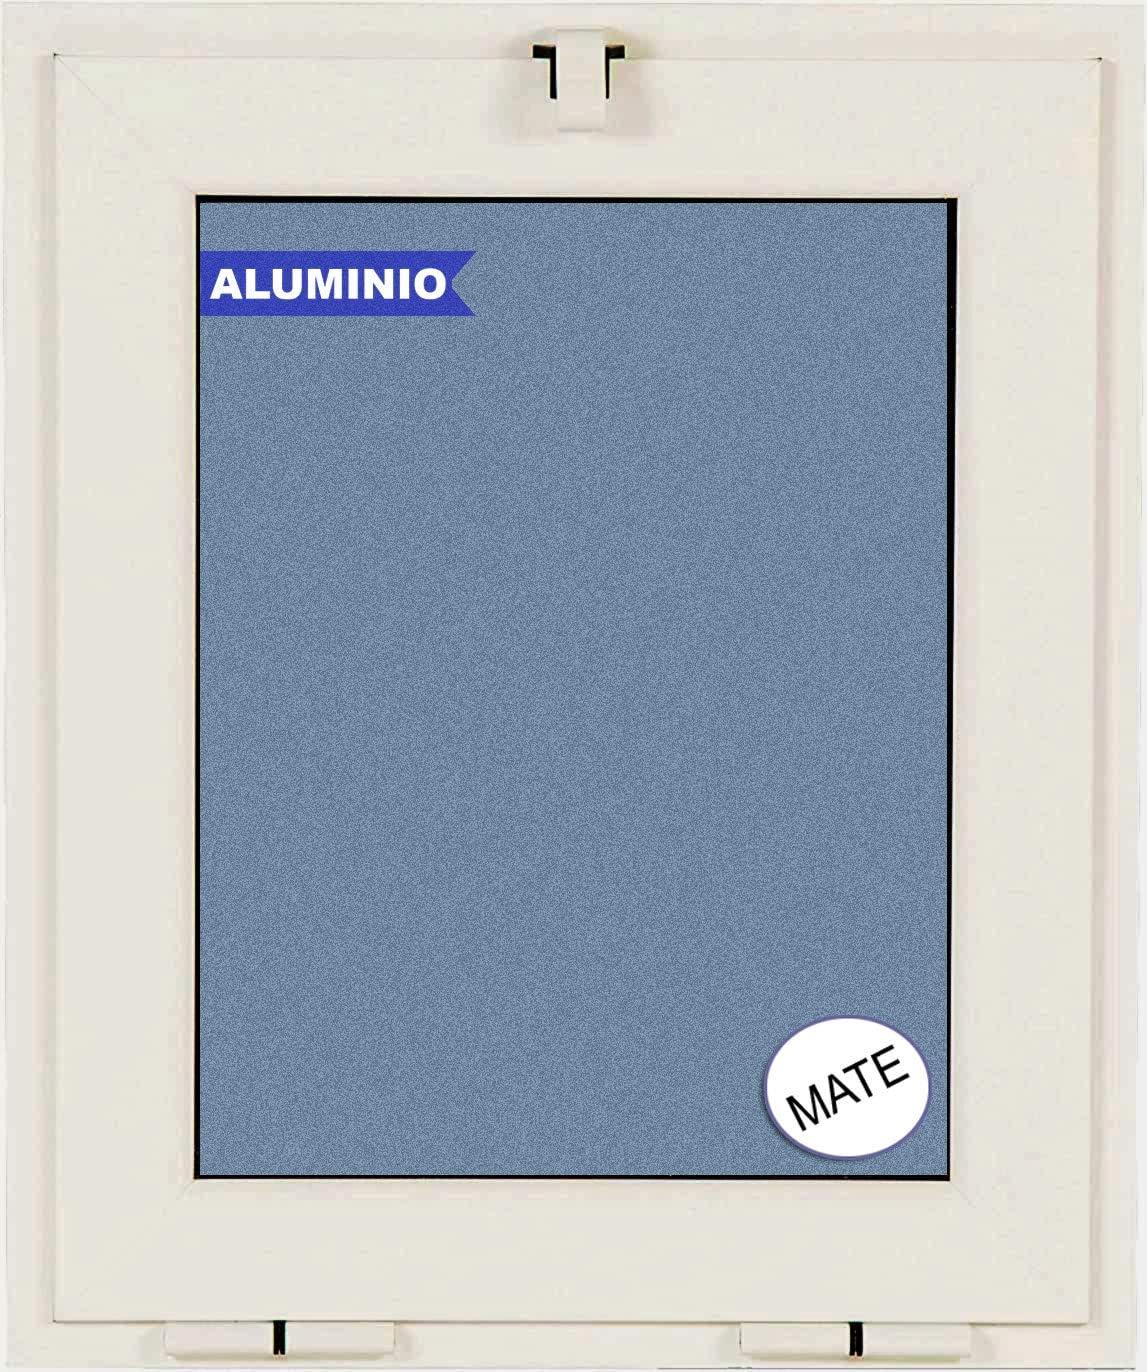 Ventana Aluminio Basculante (Golpete) 500 ancho × 600 alto 1 hoja cristal mate carglass (Climalit Mate)